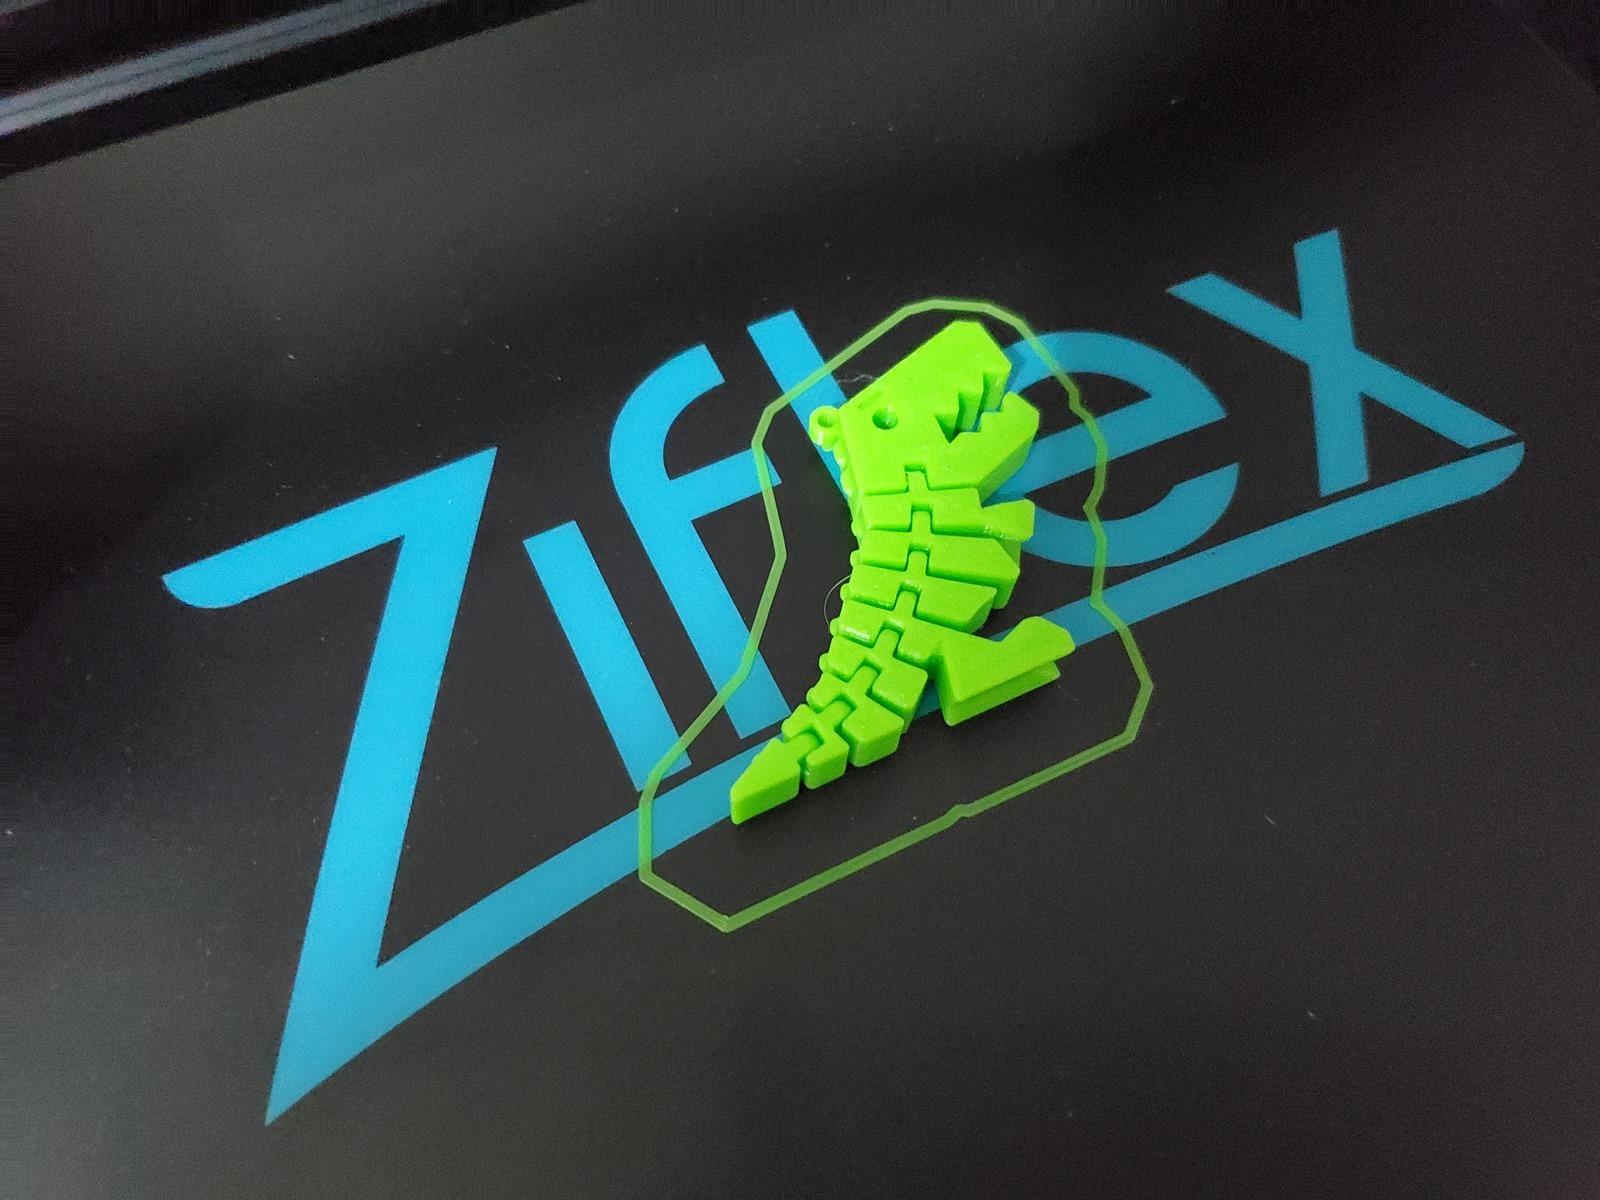 Ziflex 磁性列印底板 & 淘寶無牌版本比較分享 (磁性底板貼膜熱床防翹邊打印貼紙) @3C 達人廖阿輝